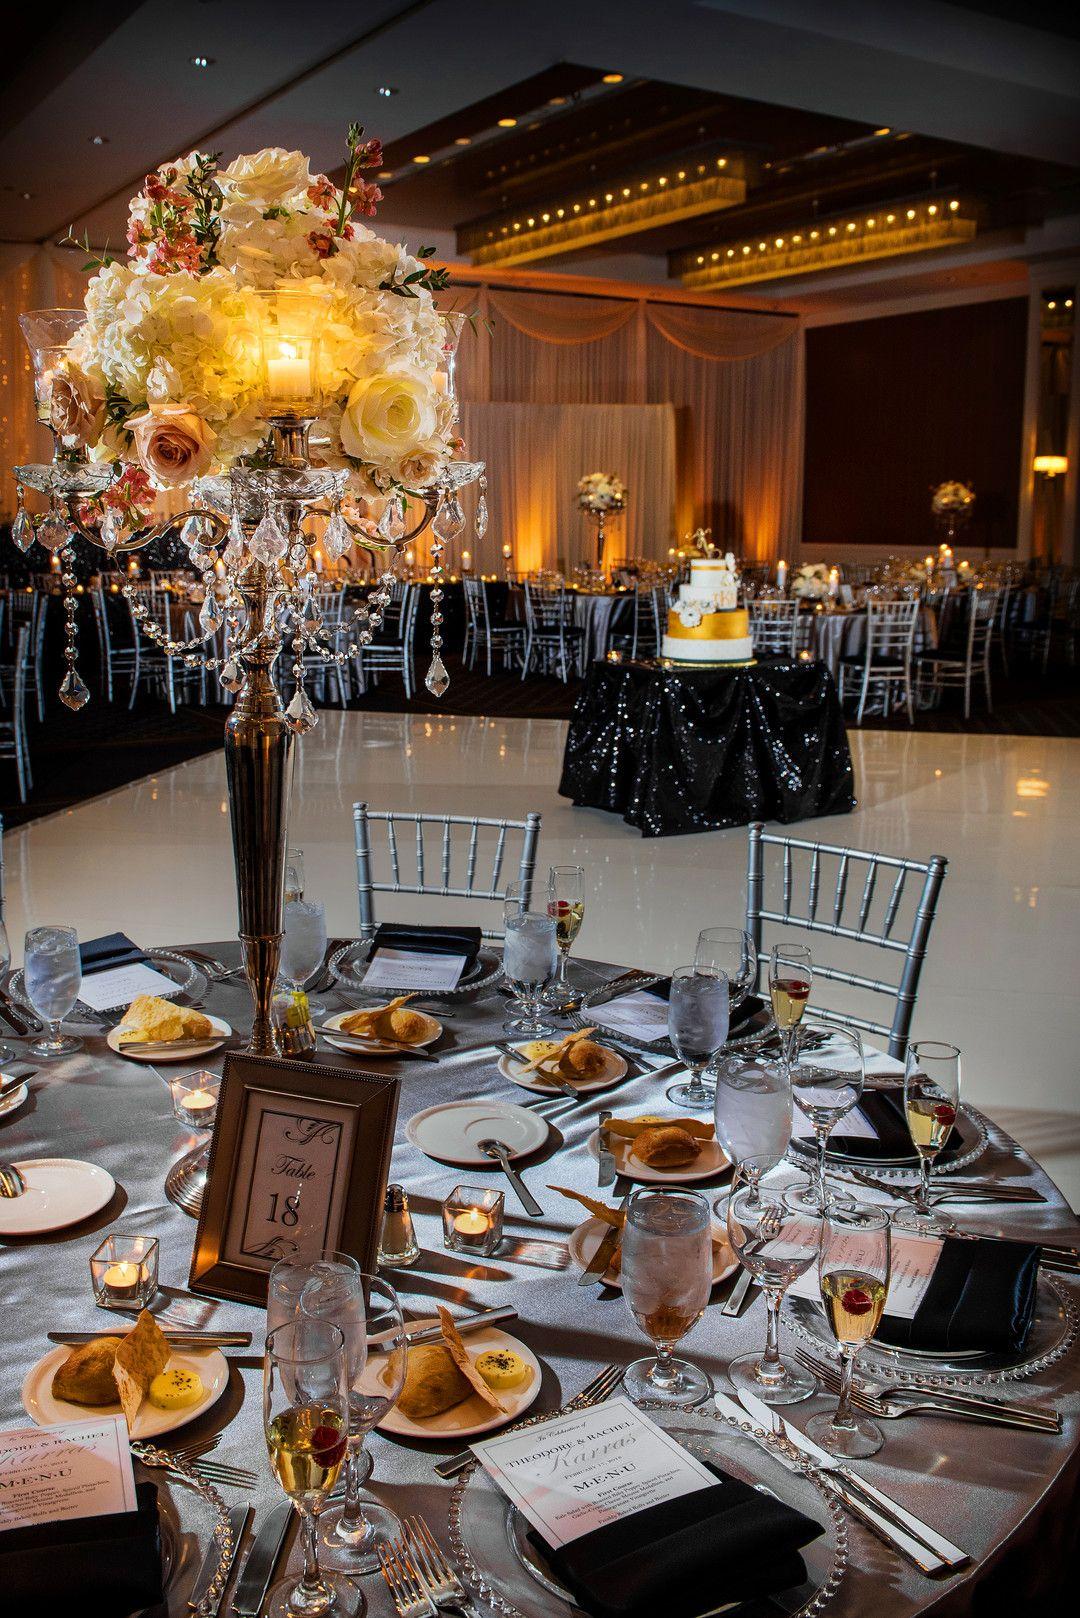 Luxurious Winter Wedding At Hotel Arista In Naperville Il Captured By Jason Kaczorowski Wedding Reception Decorations Winter Wedding Wedding Reception Design